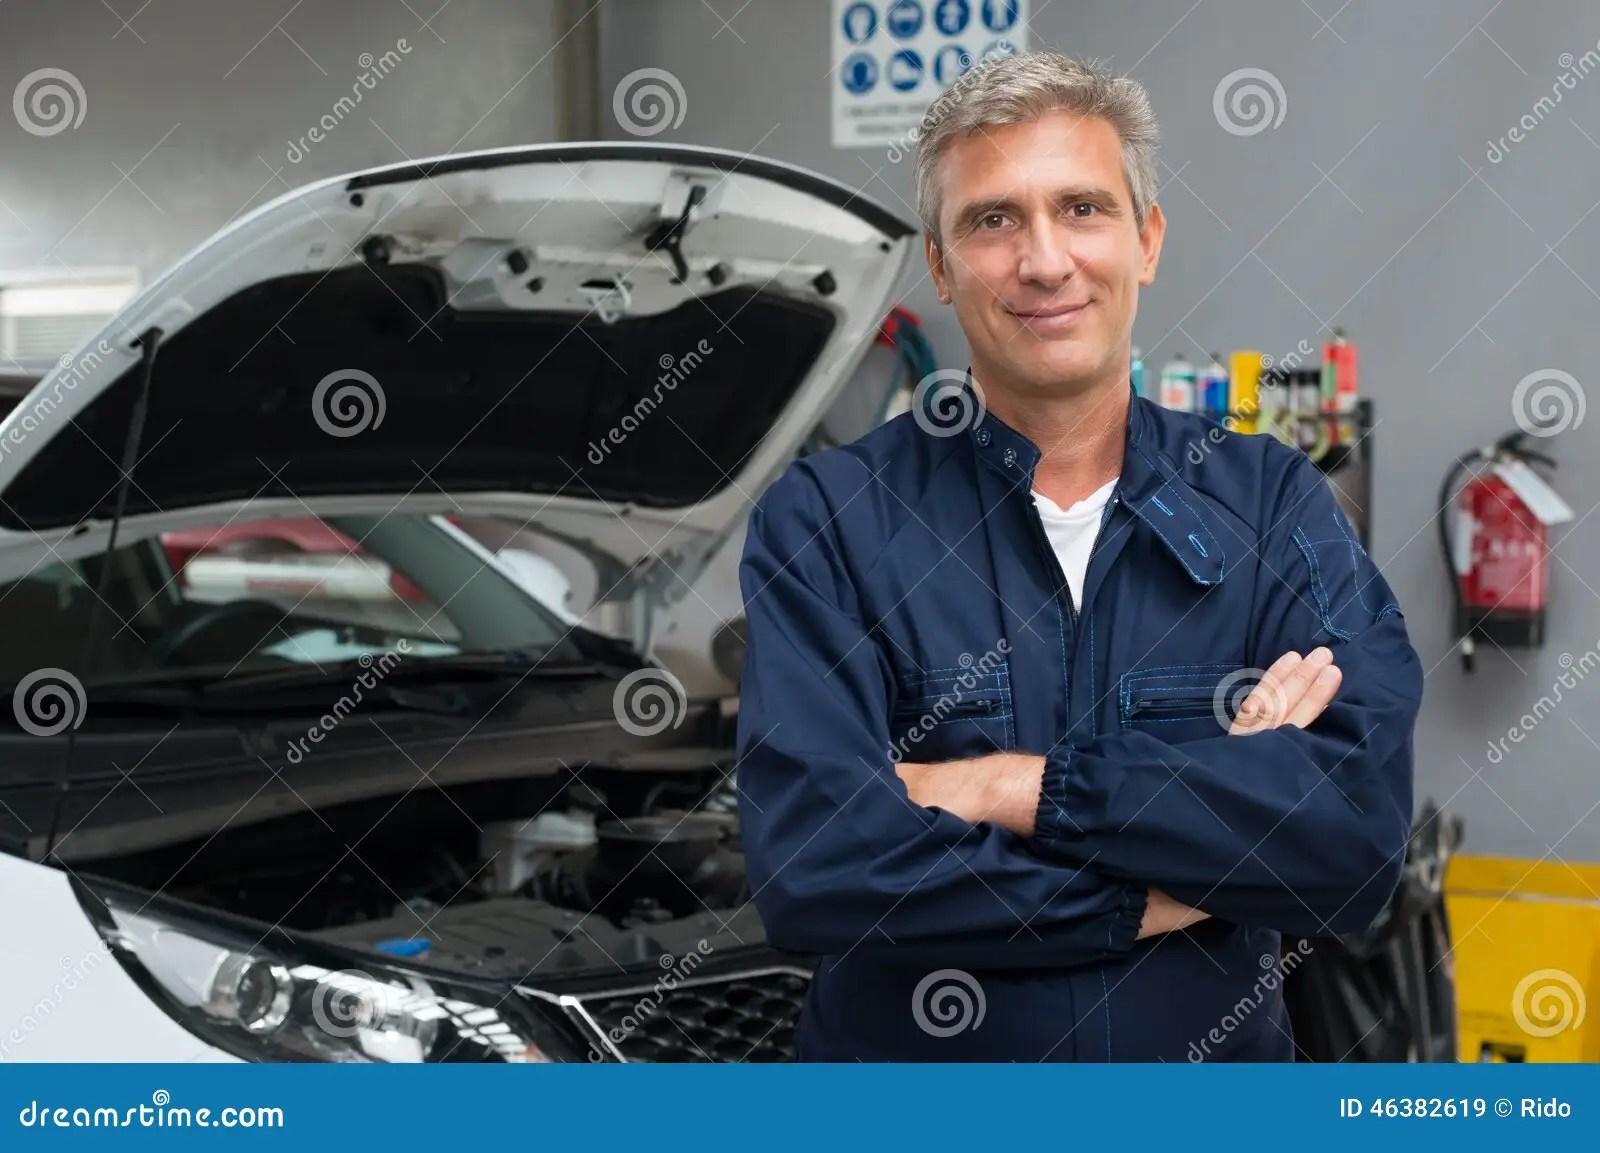 Proud Auto Mechanic Stock Photo  Image 46382619